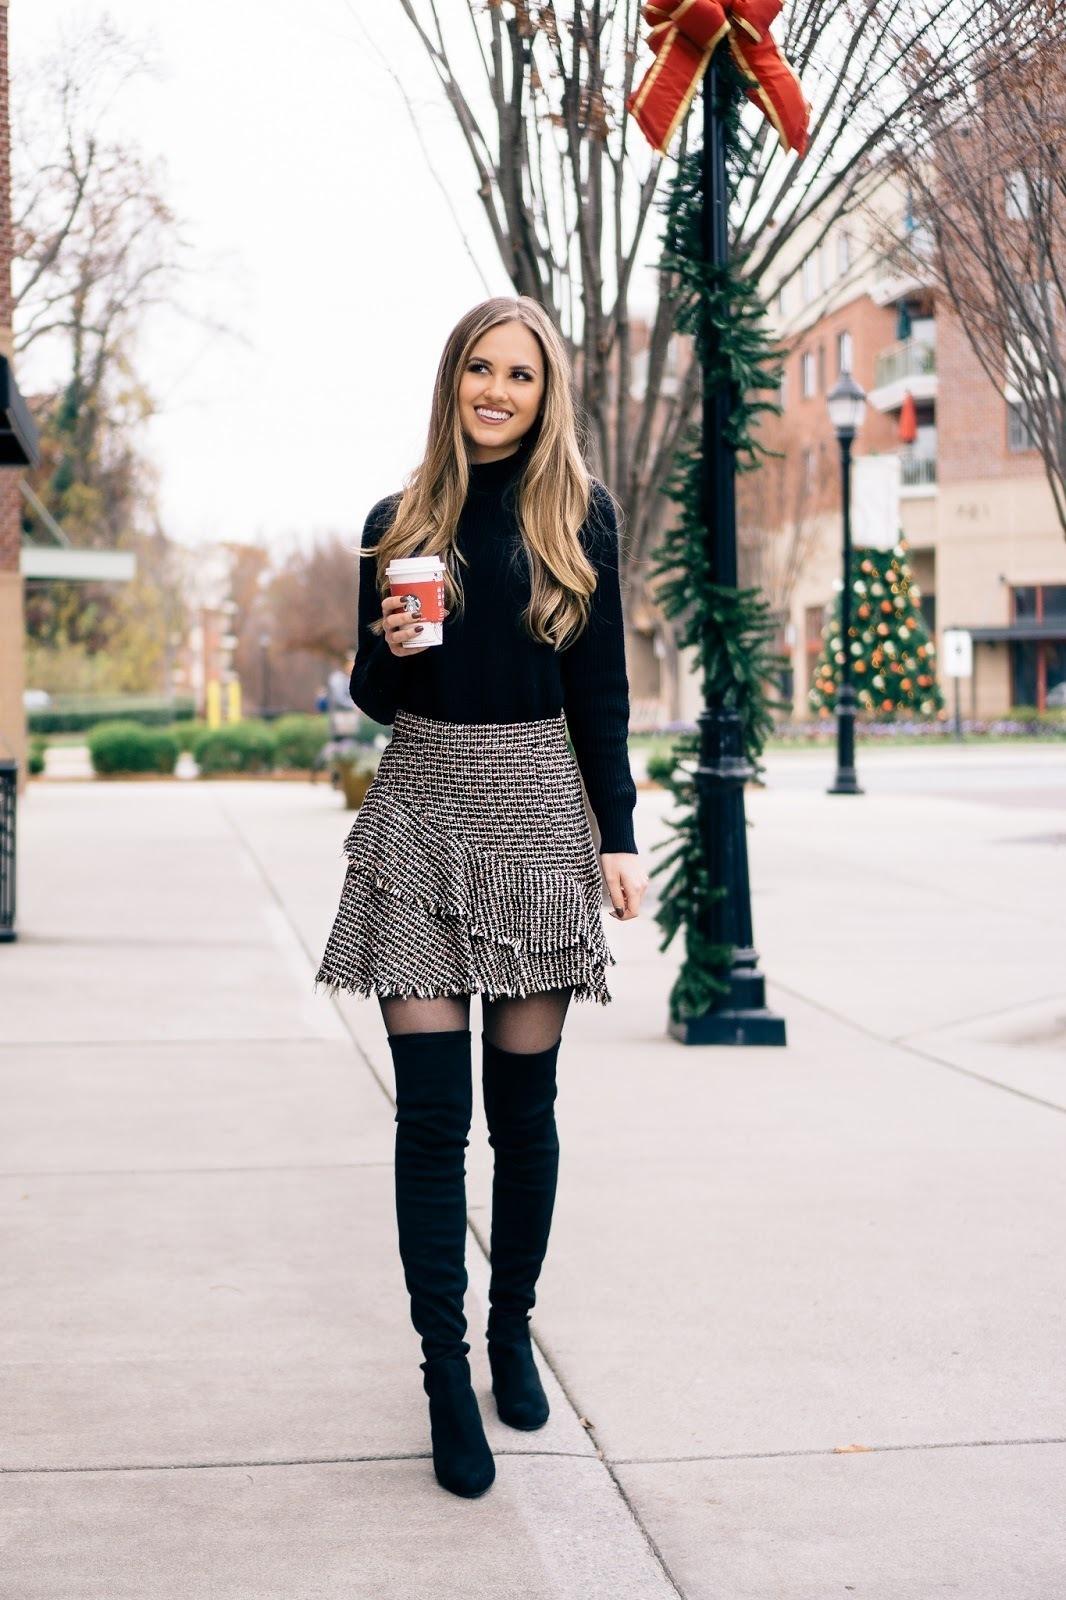 cdb1f2b1c Women's Black Suede Over The Knee Boots, Grey Tweed Mini Skirt, Black  Turtleneck   Women's Fashion   Lookastic UK